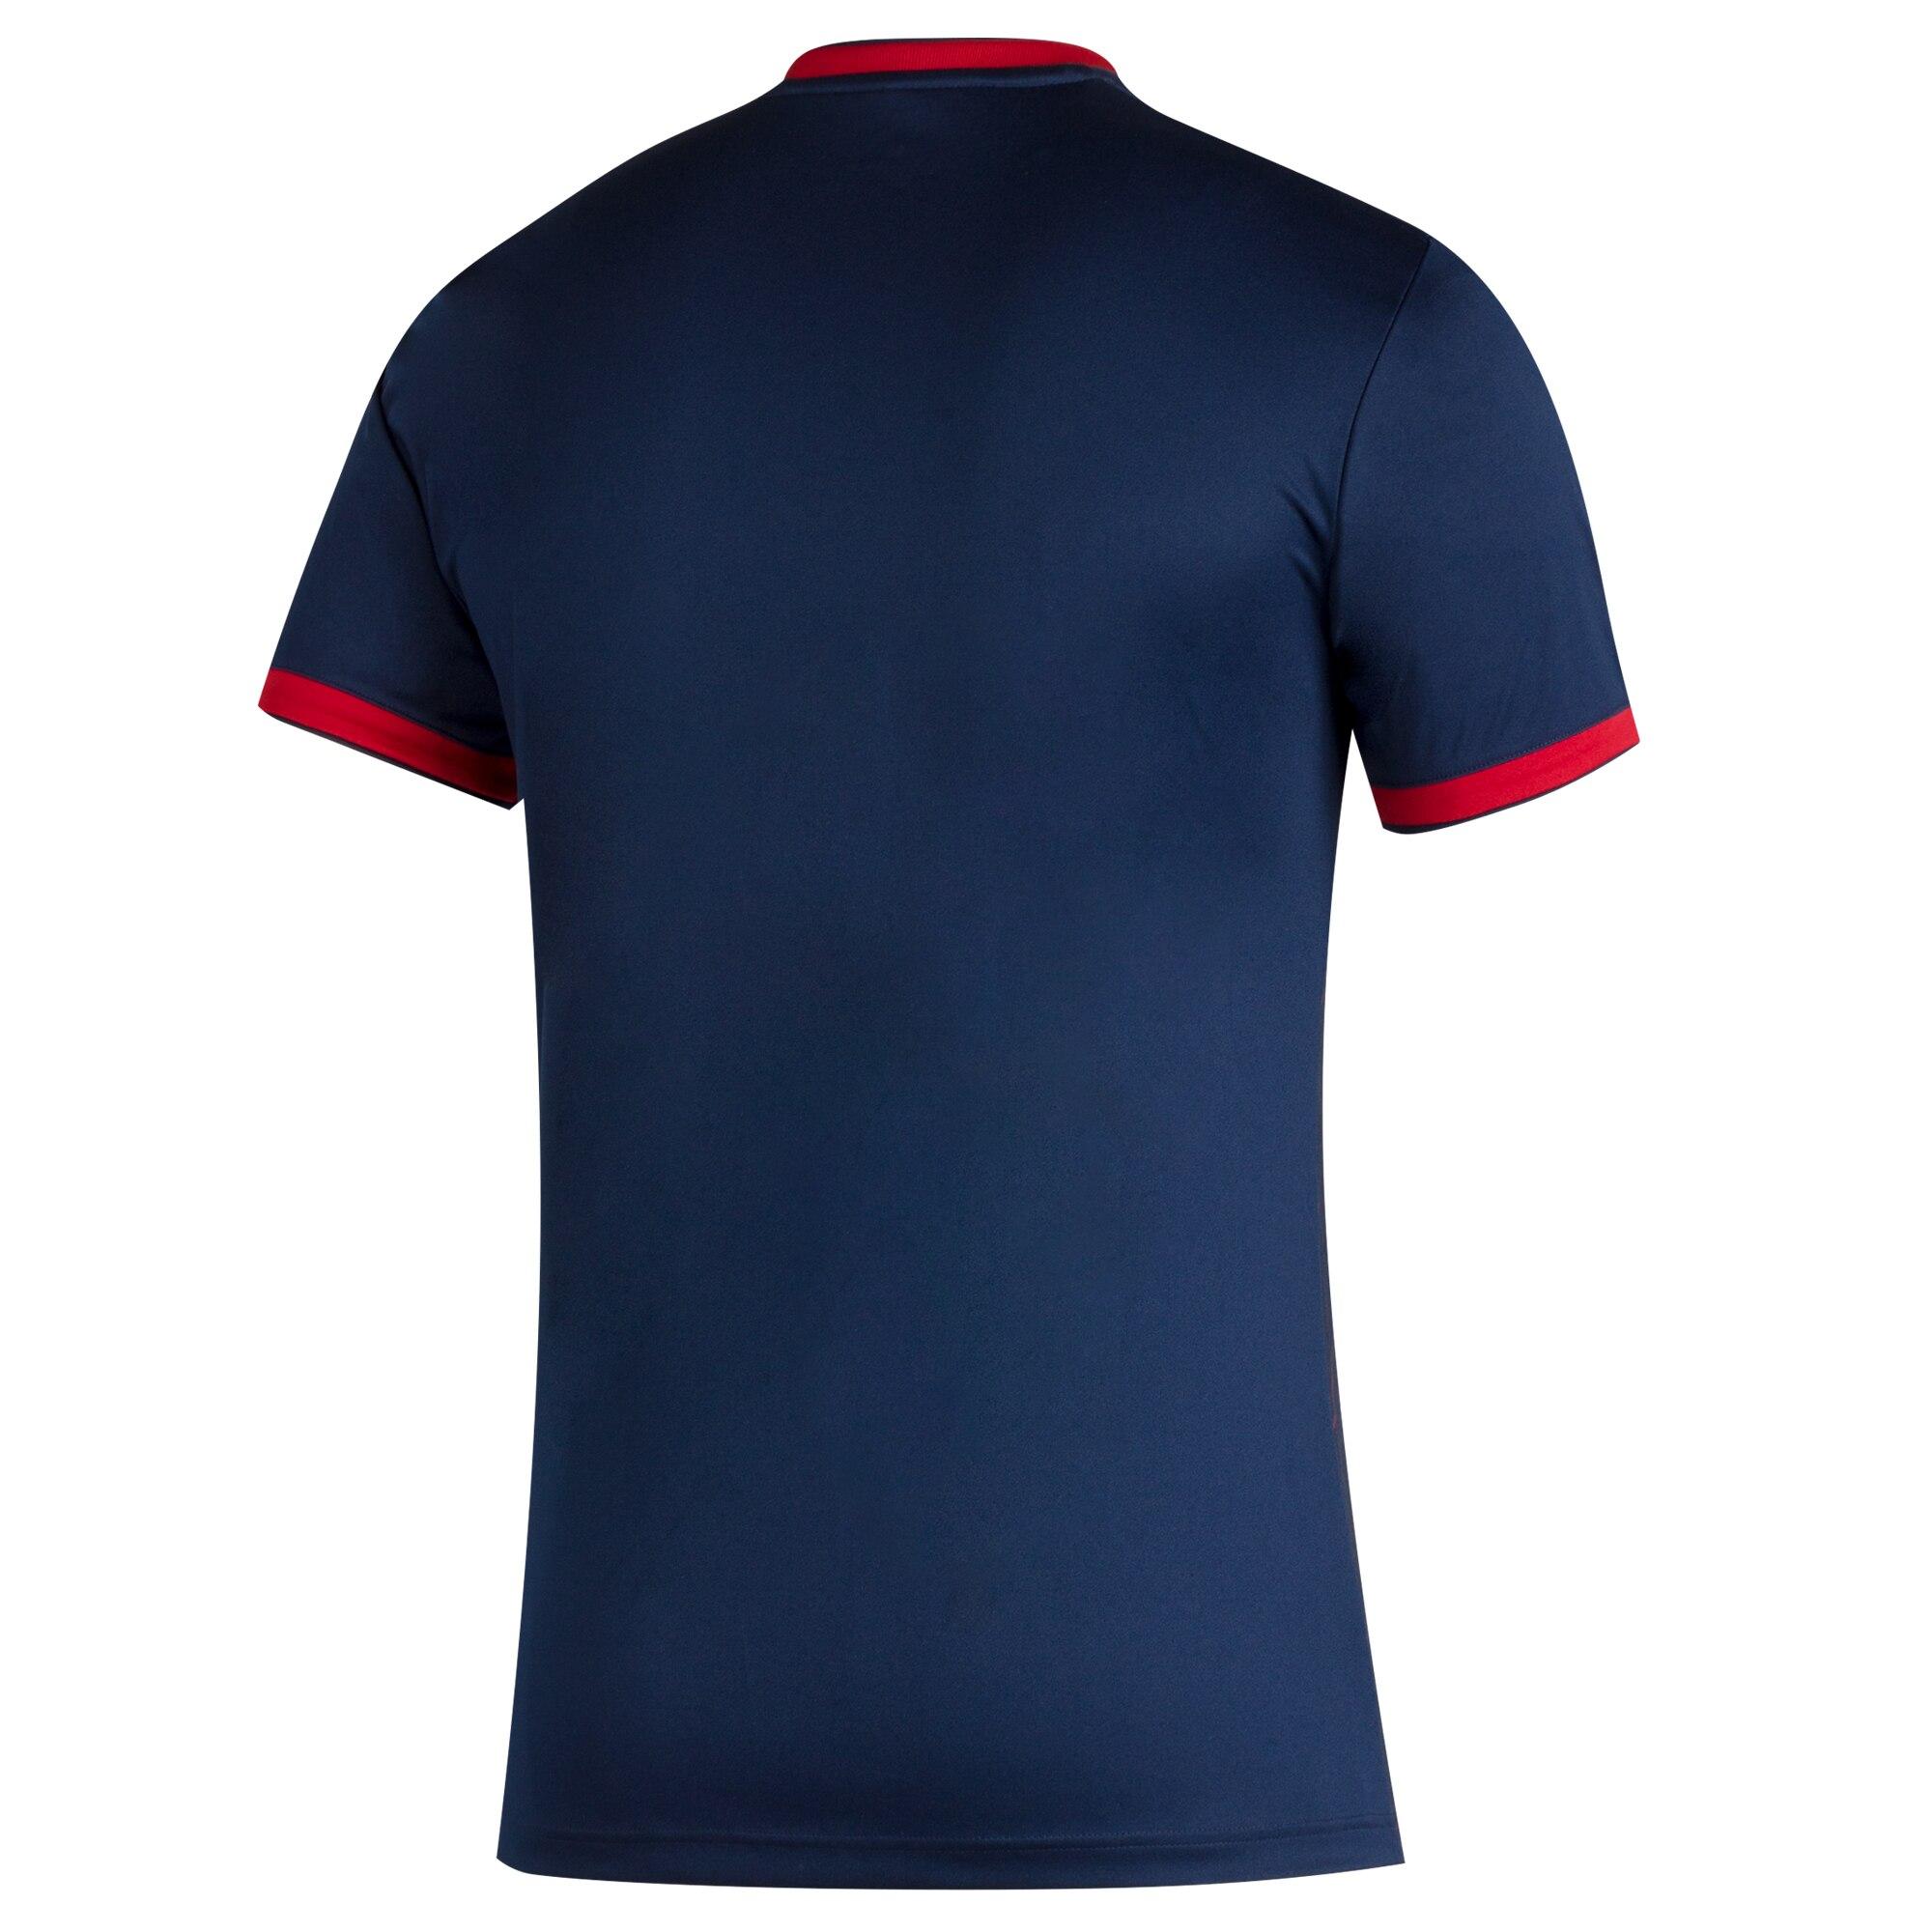 Chicago Fire 2020 21 Adidas Away Kit 20 21 Kits Football Shirt